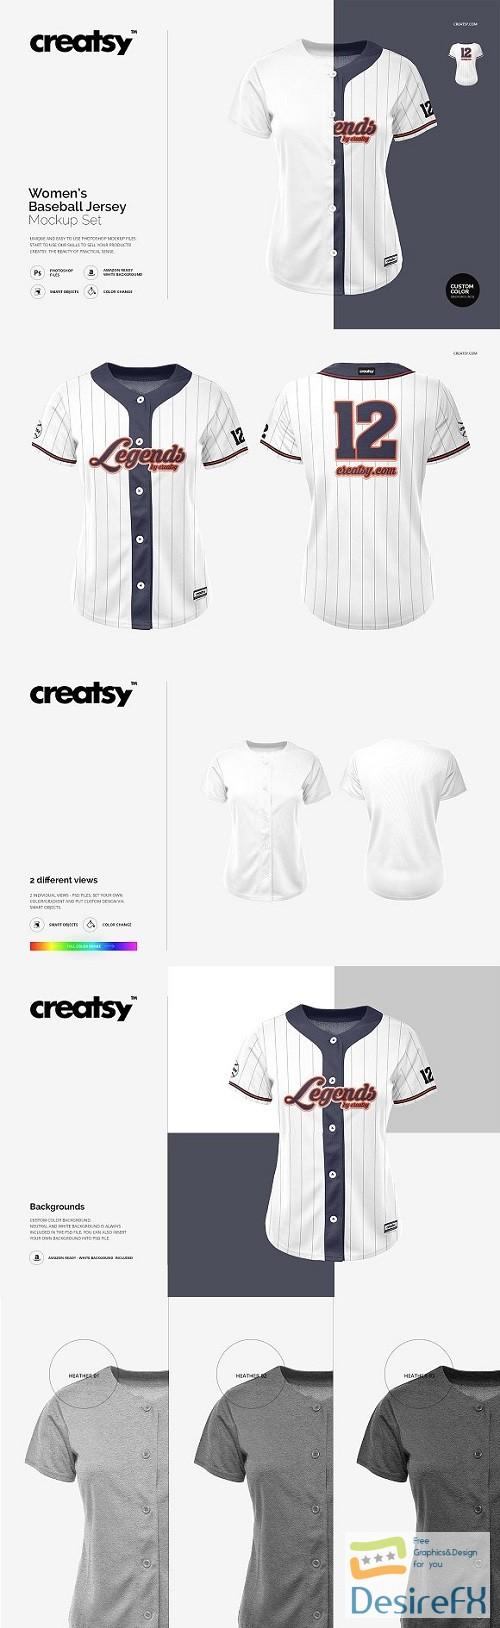 Download Desirefx.com   Download Women's Baseball Jersey Mockup Set... Free Mockups